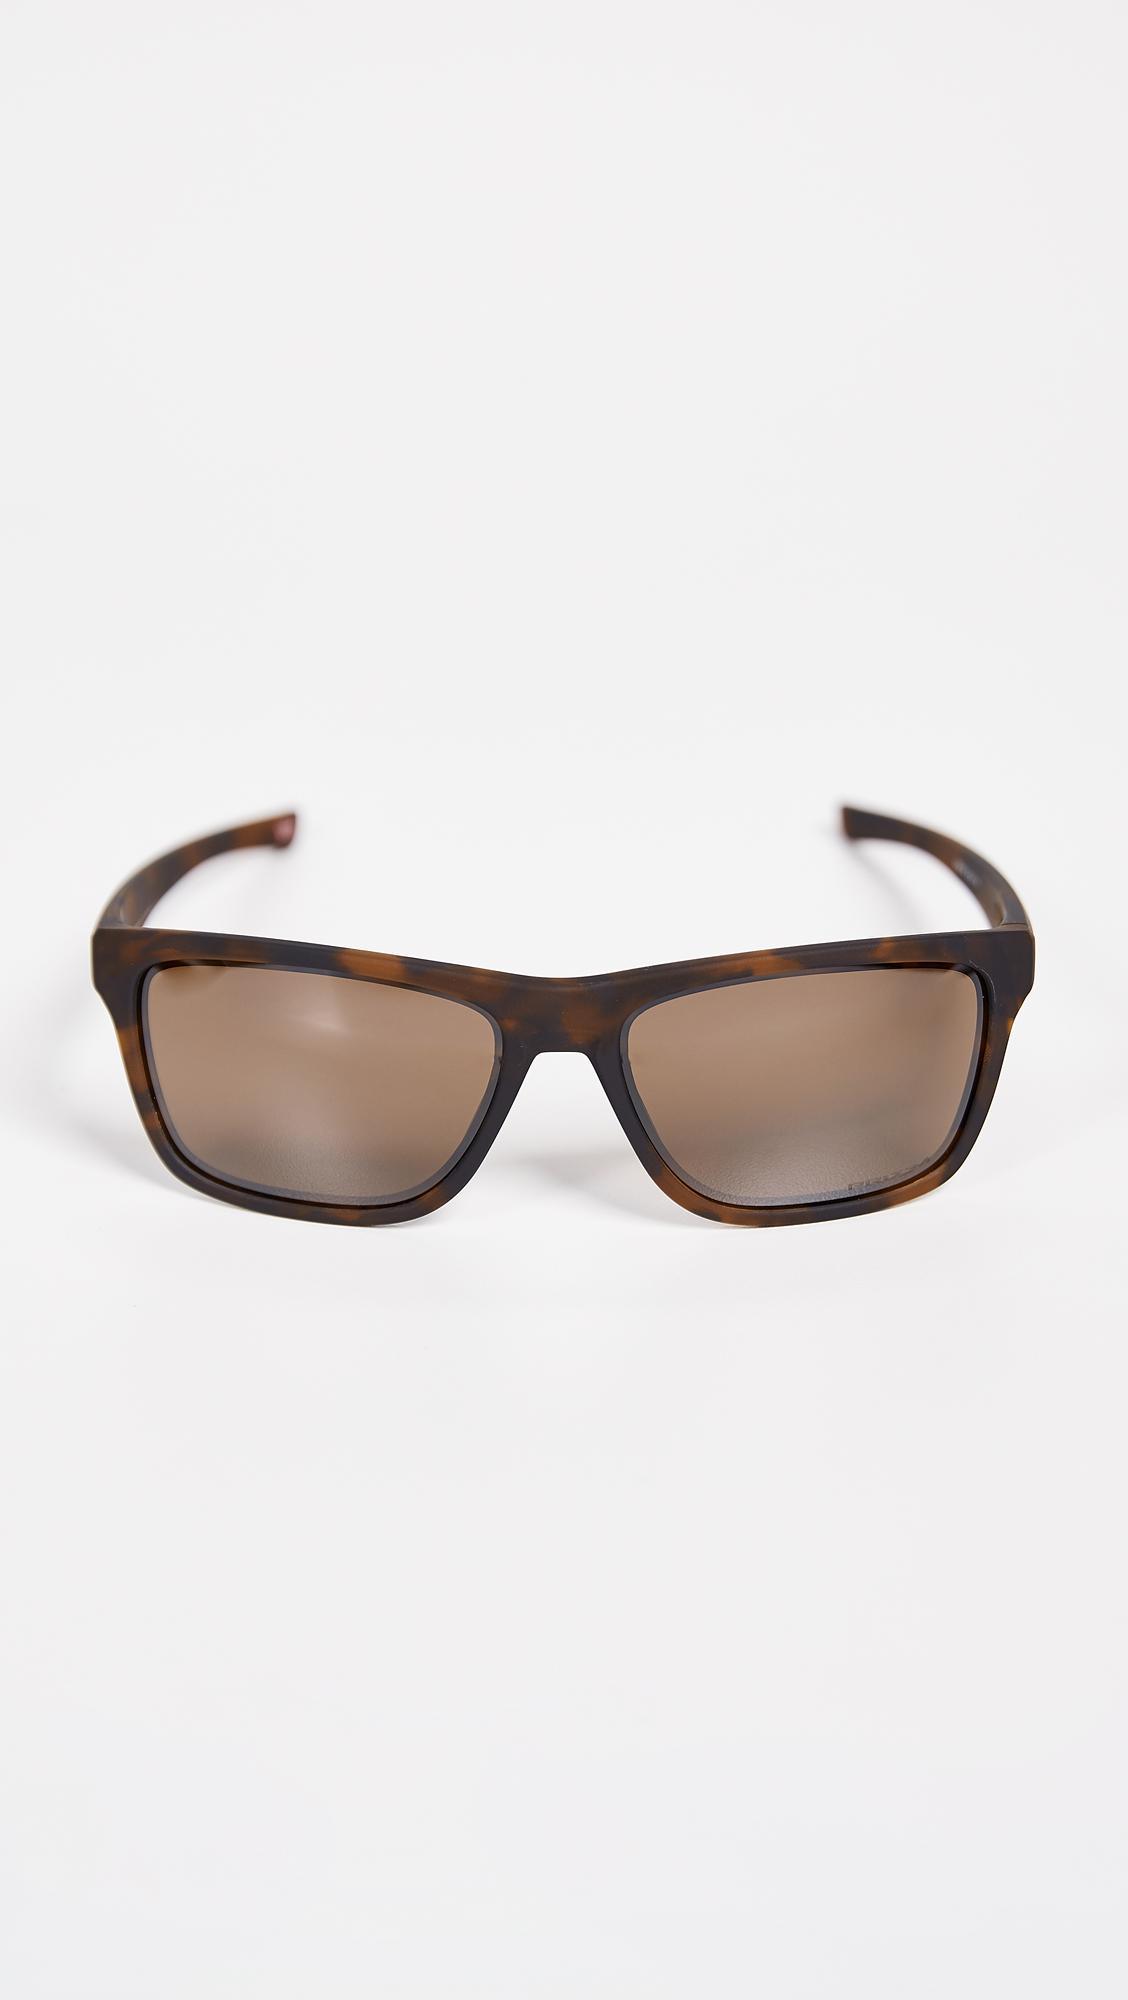 8706026ec5 Oakley Holston Sunglasses in Brown for Men - Lyst